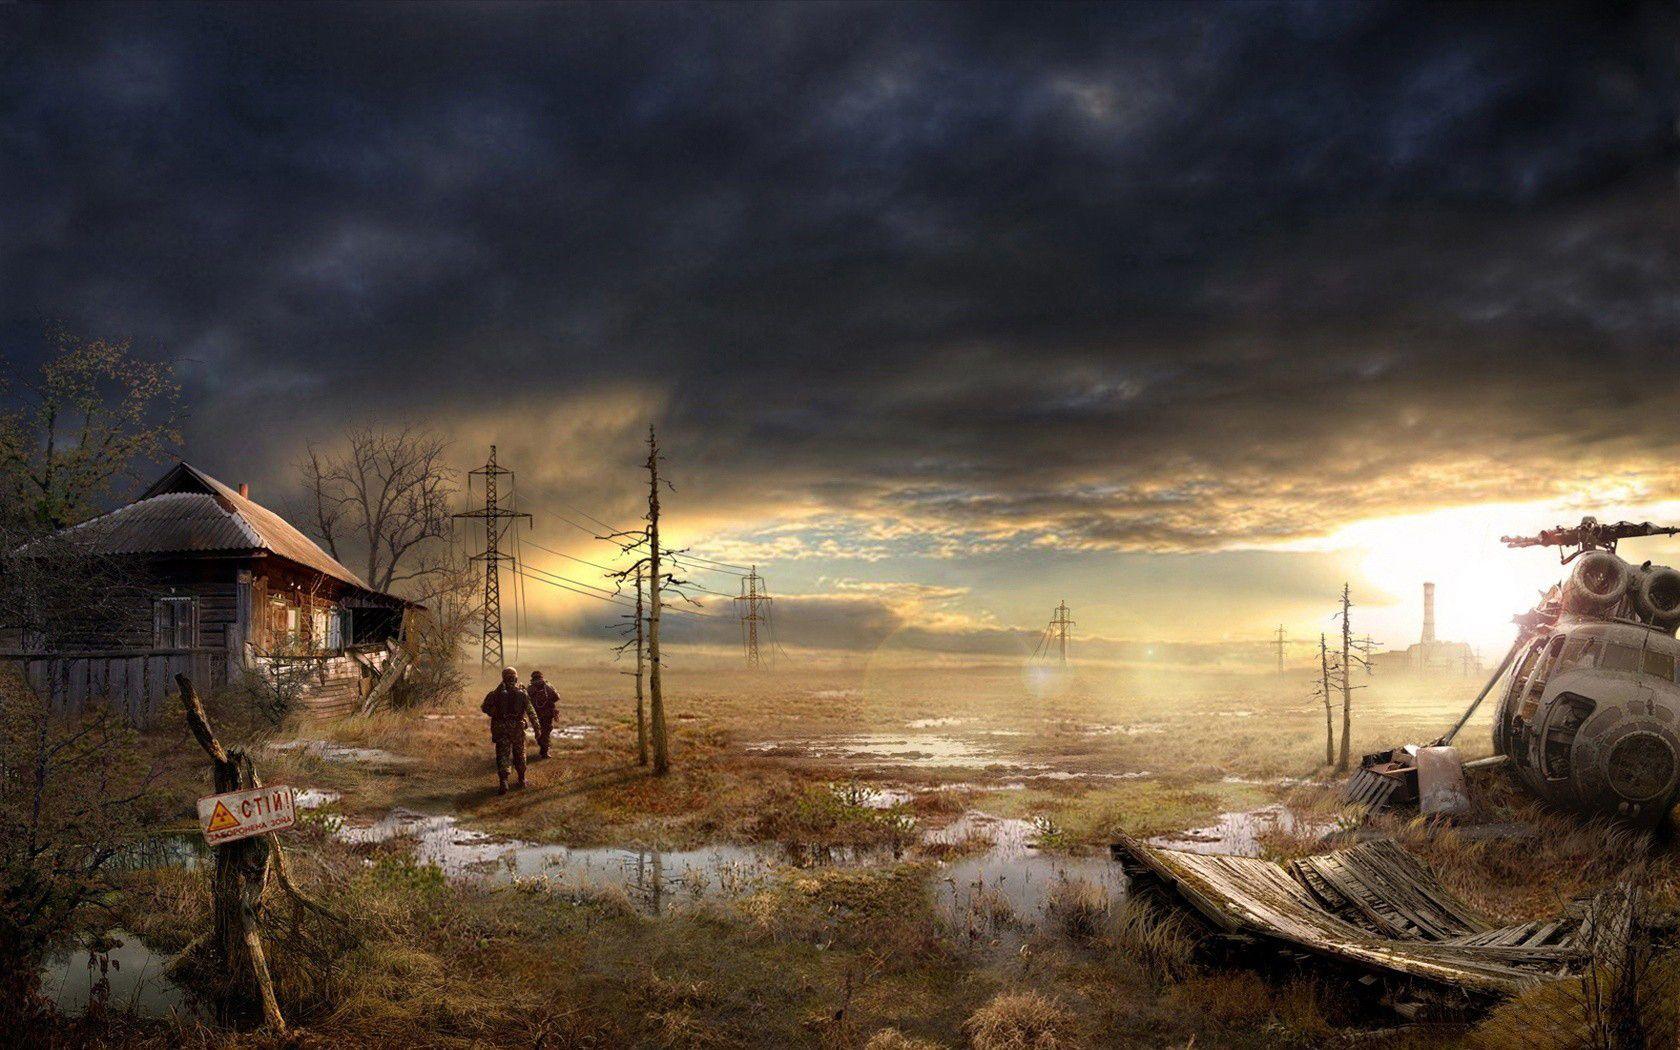 Post Apocalyptic Computer Wallpapers, Desktop Backgrounds 1680x1050 Id: 344996